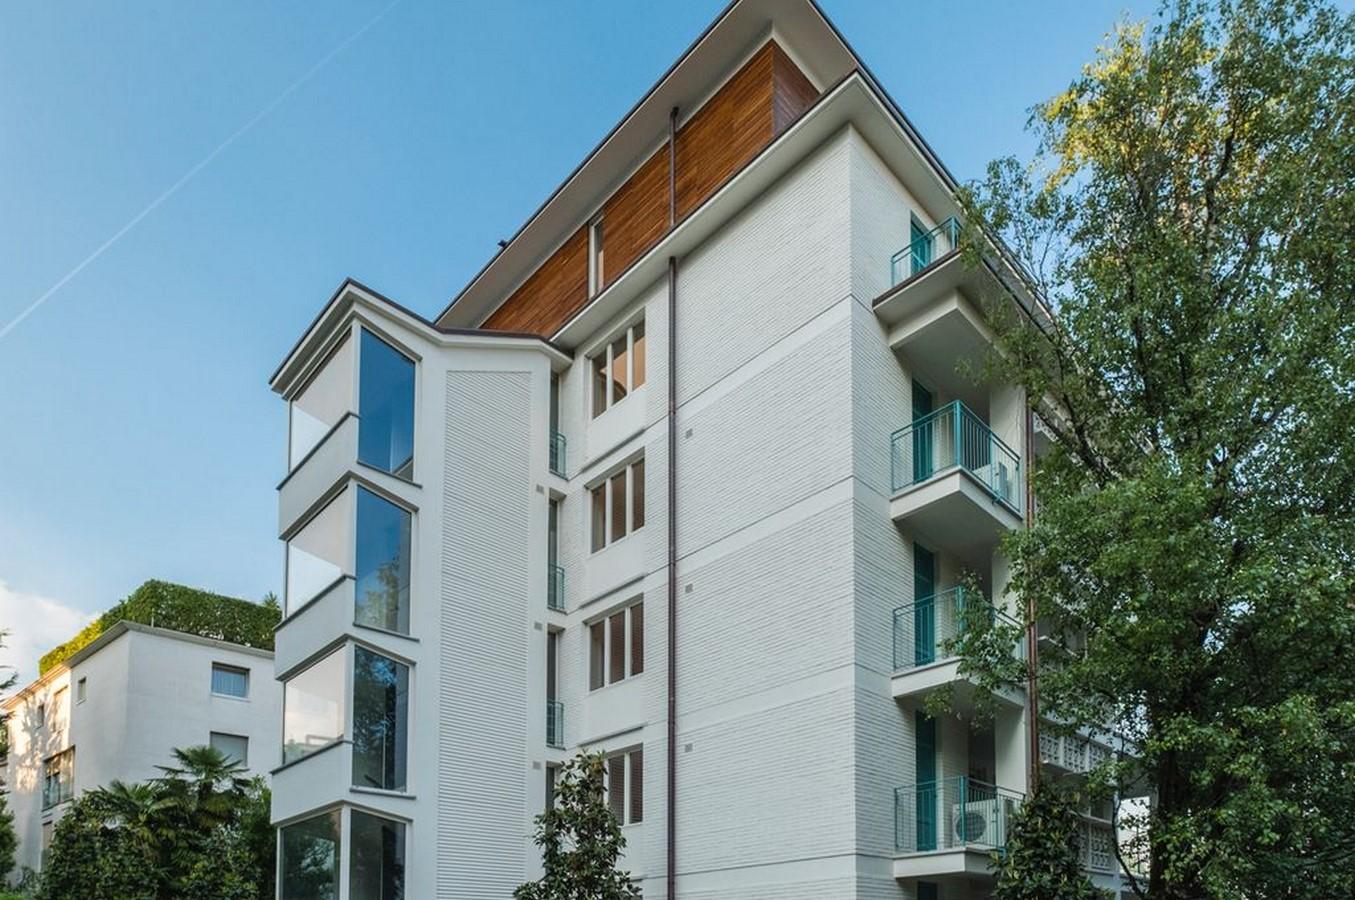 Solatia Apartment House, Lugano (1952) - Sheet1